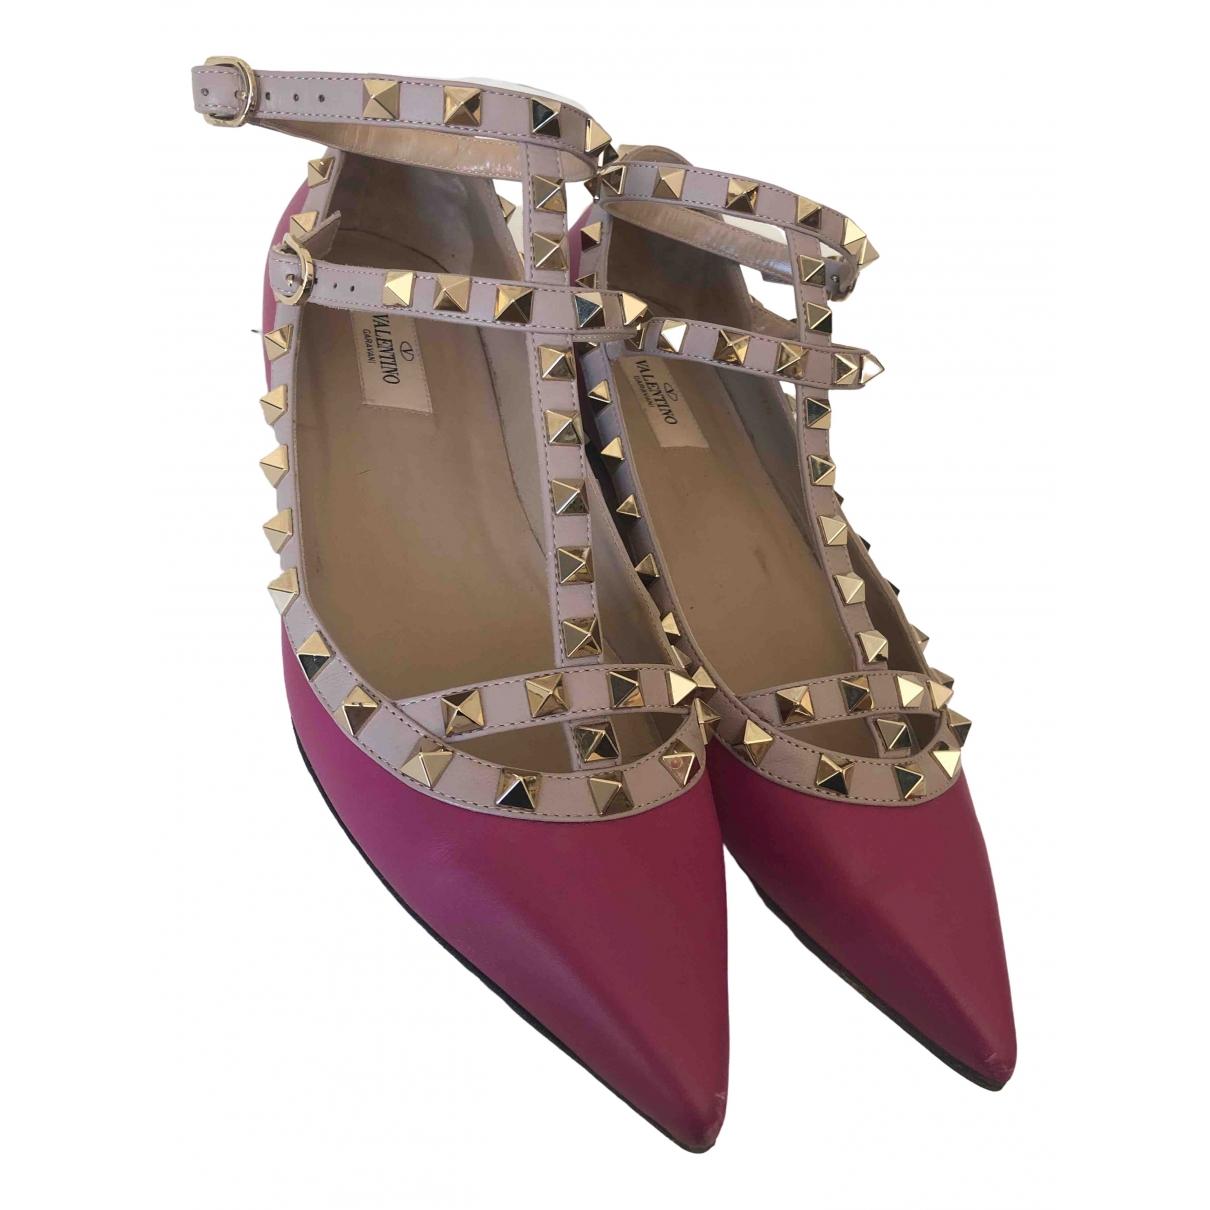 Valentino Garavani Rockstud Purple Leather Ballet flats for Women 39.5 EU